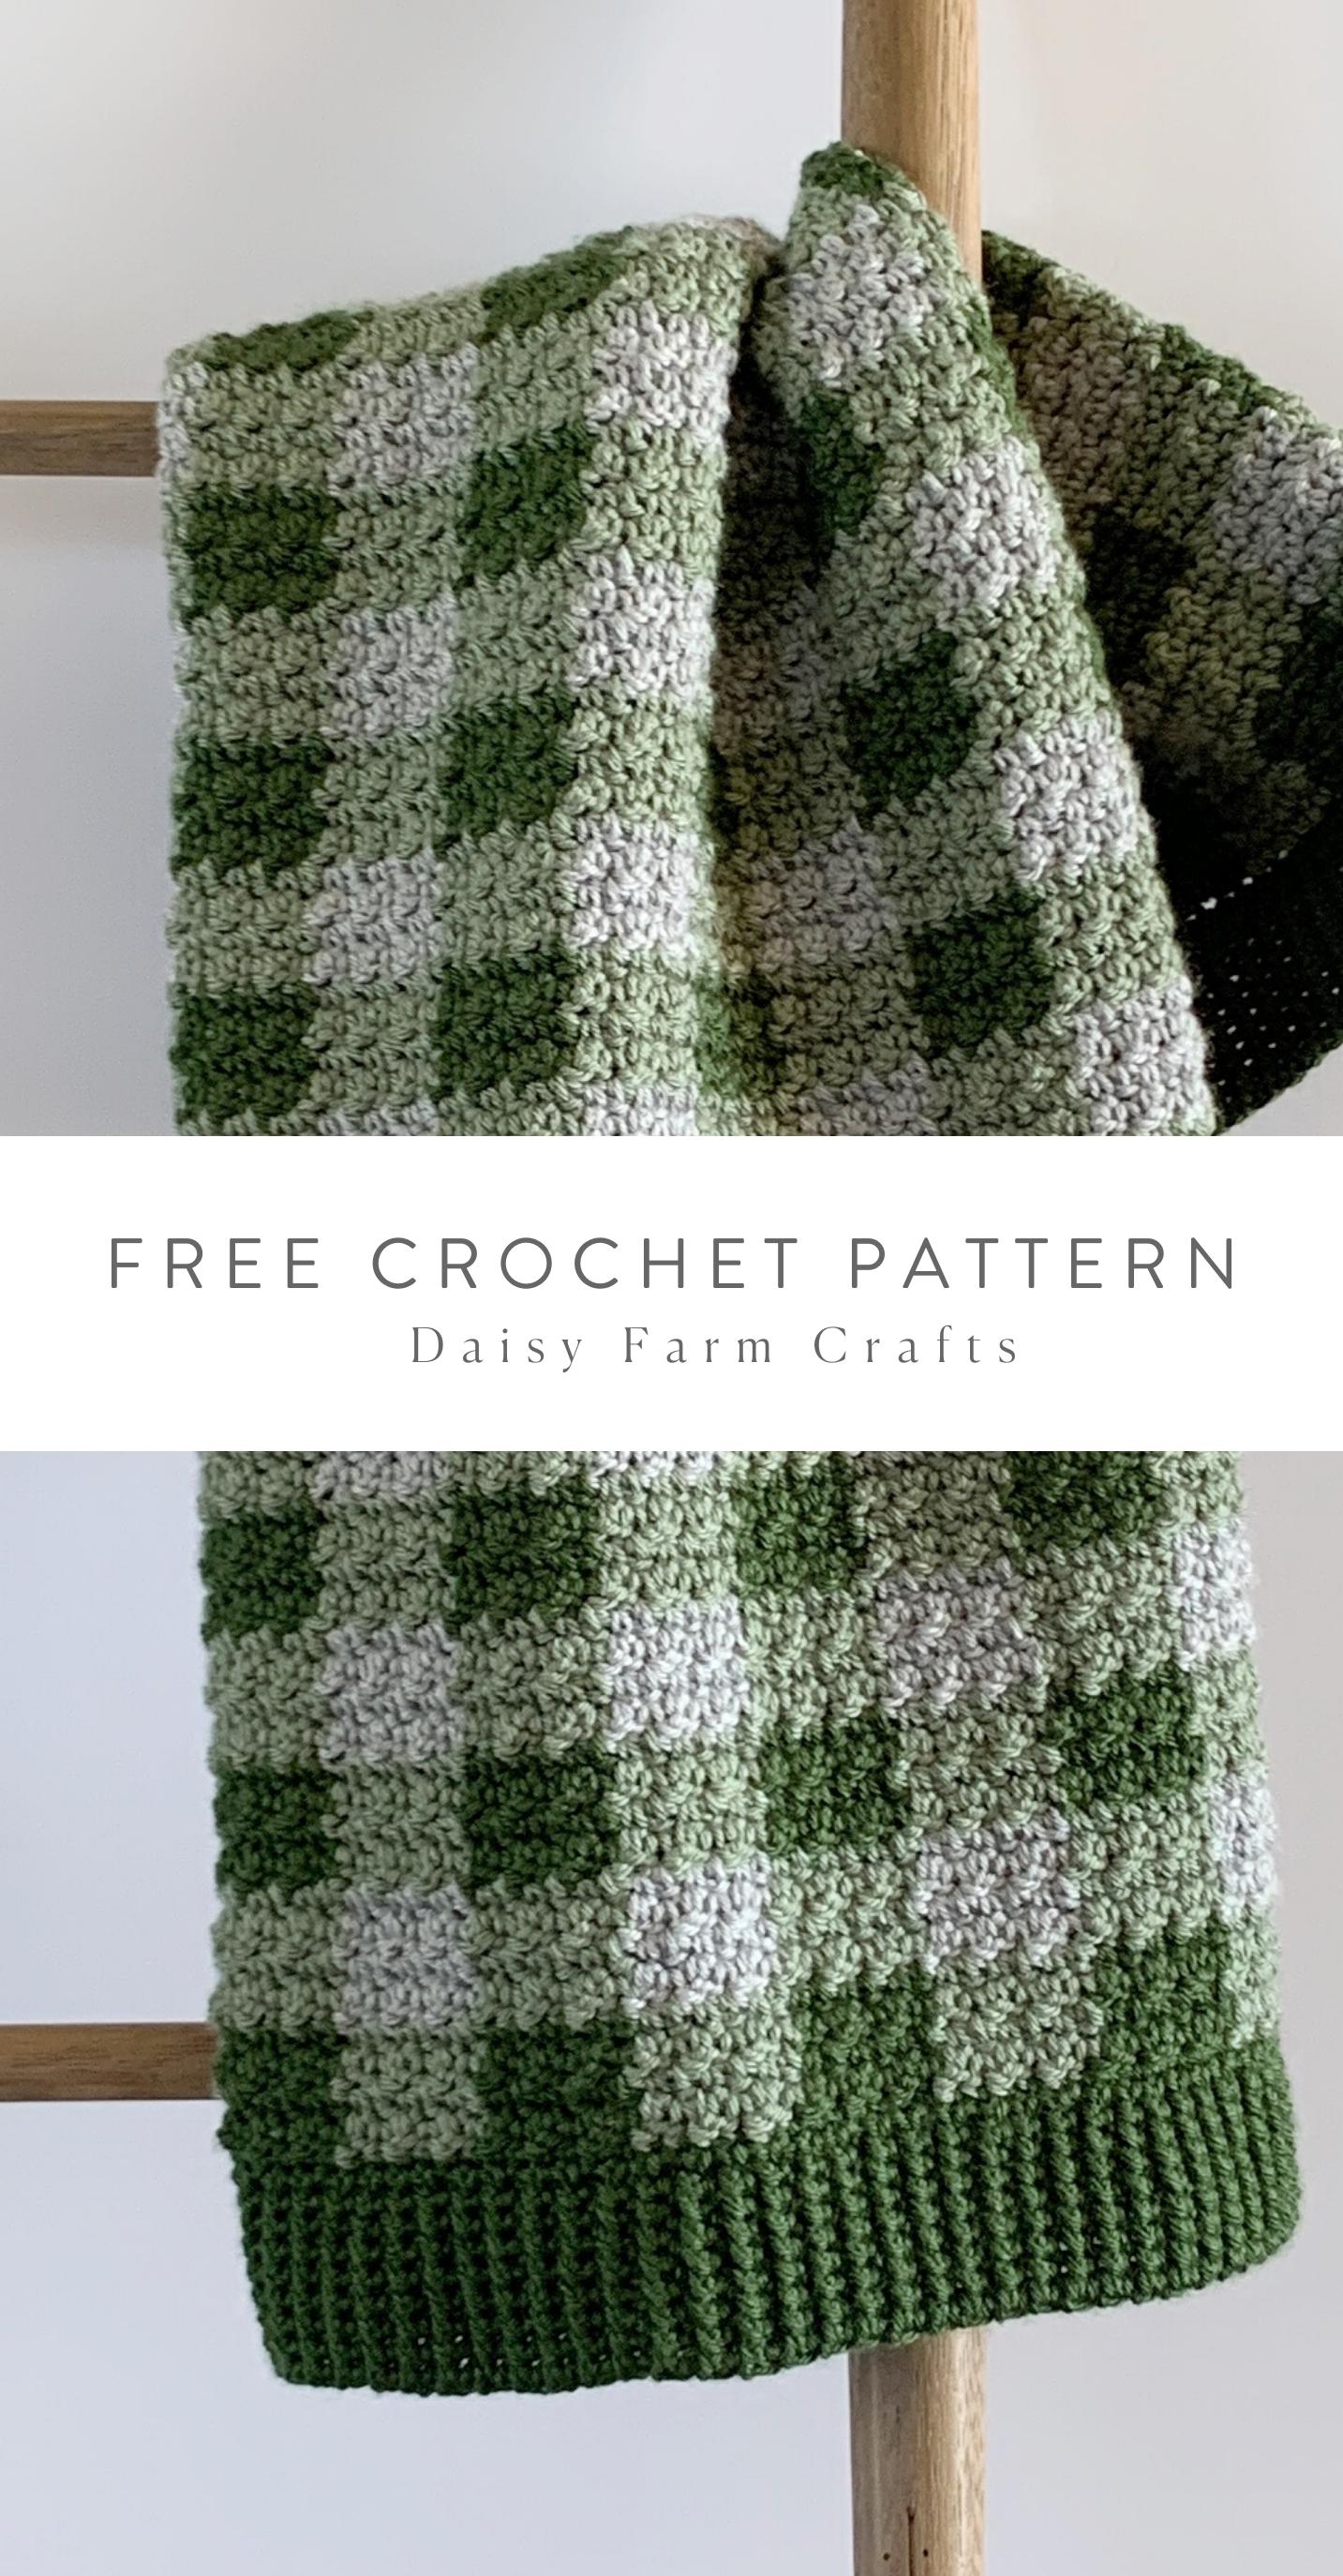 Free Pattern - Crochet Green Gingham Blanket